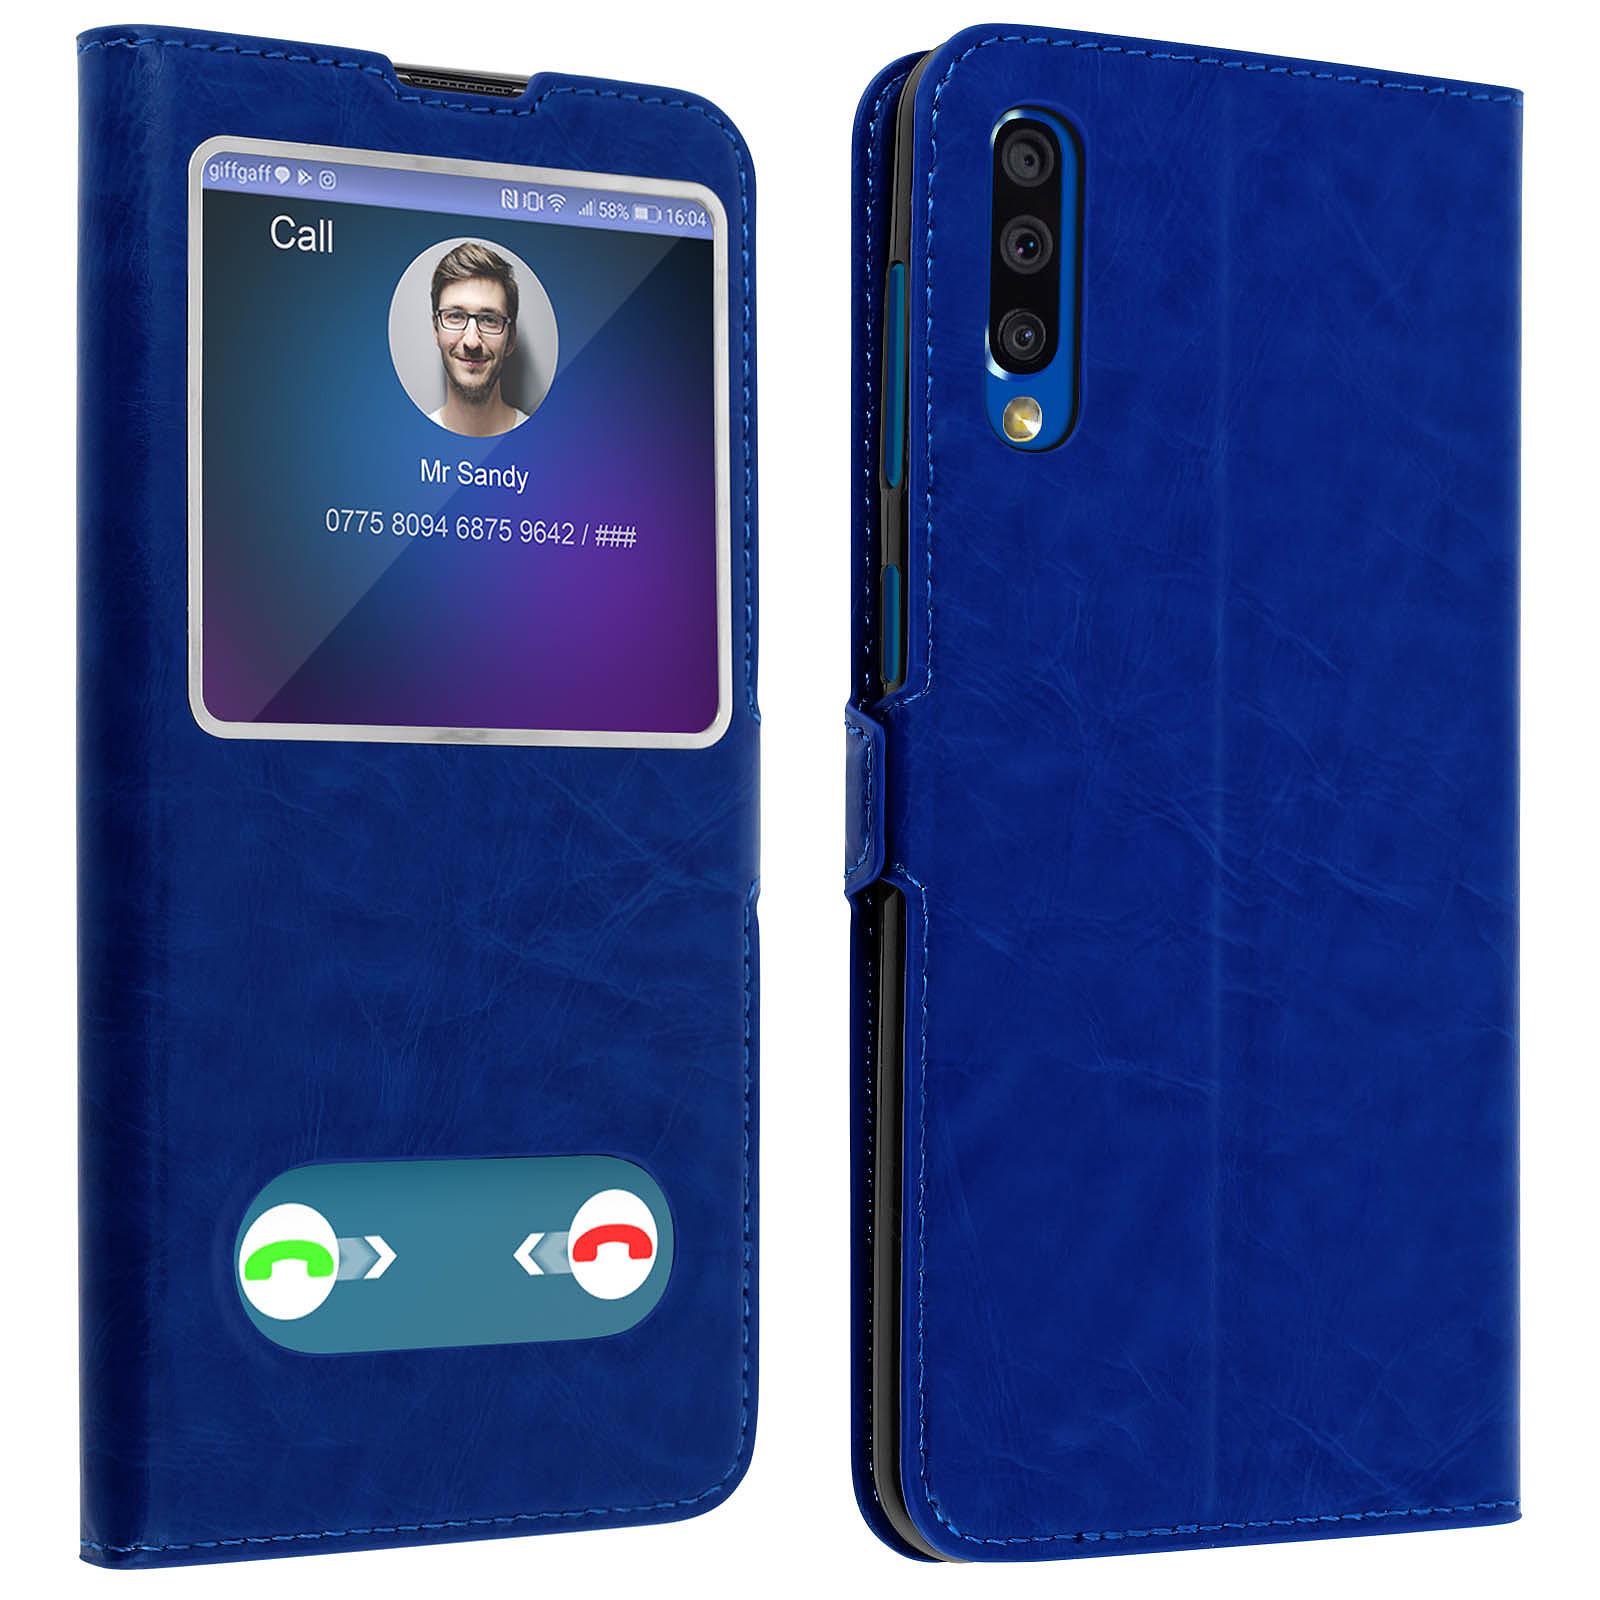 Avizar Etui folio Bleu pour Samsung Galaxy A50 , Samsung Galaxy A30s